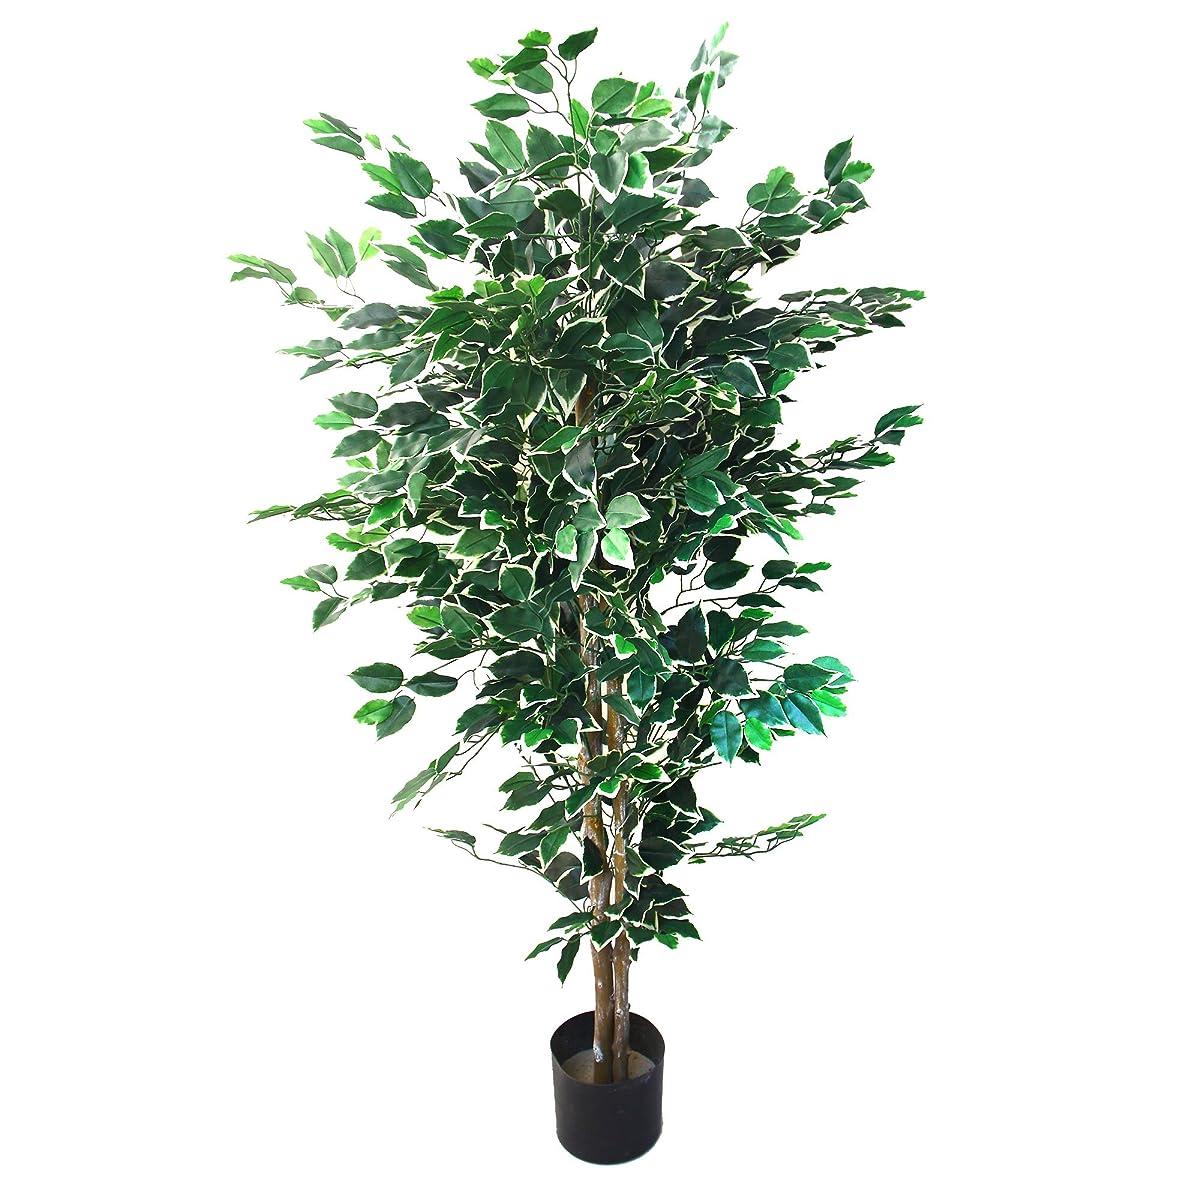 Pure Garden Ficus Tree, 5-Feet